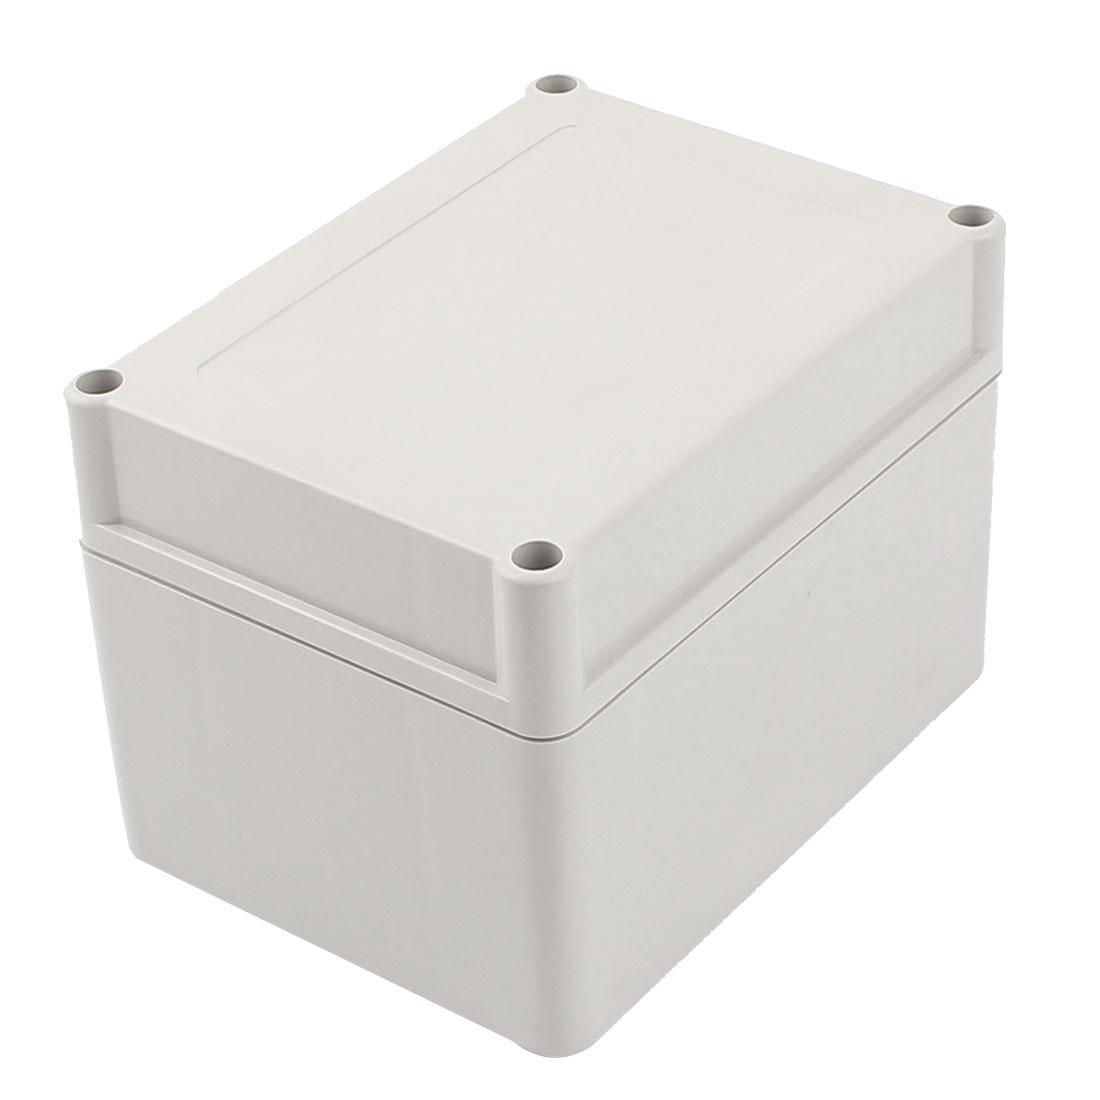 138x103x100mm Dustproof IP65 Power Project Plastic Case Junction Box